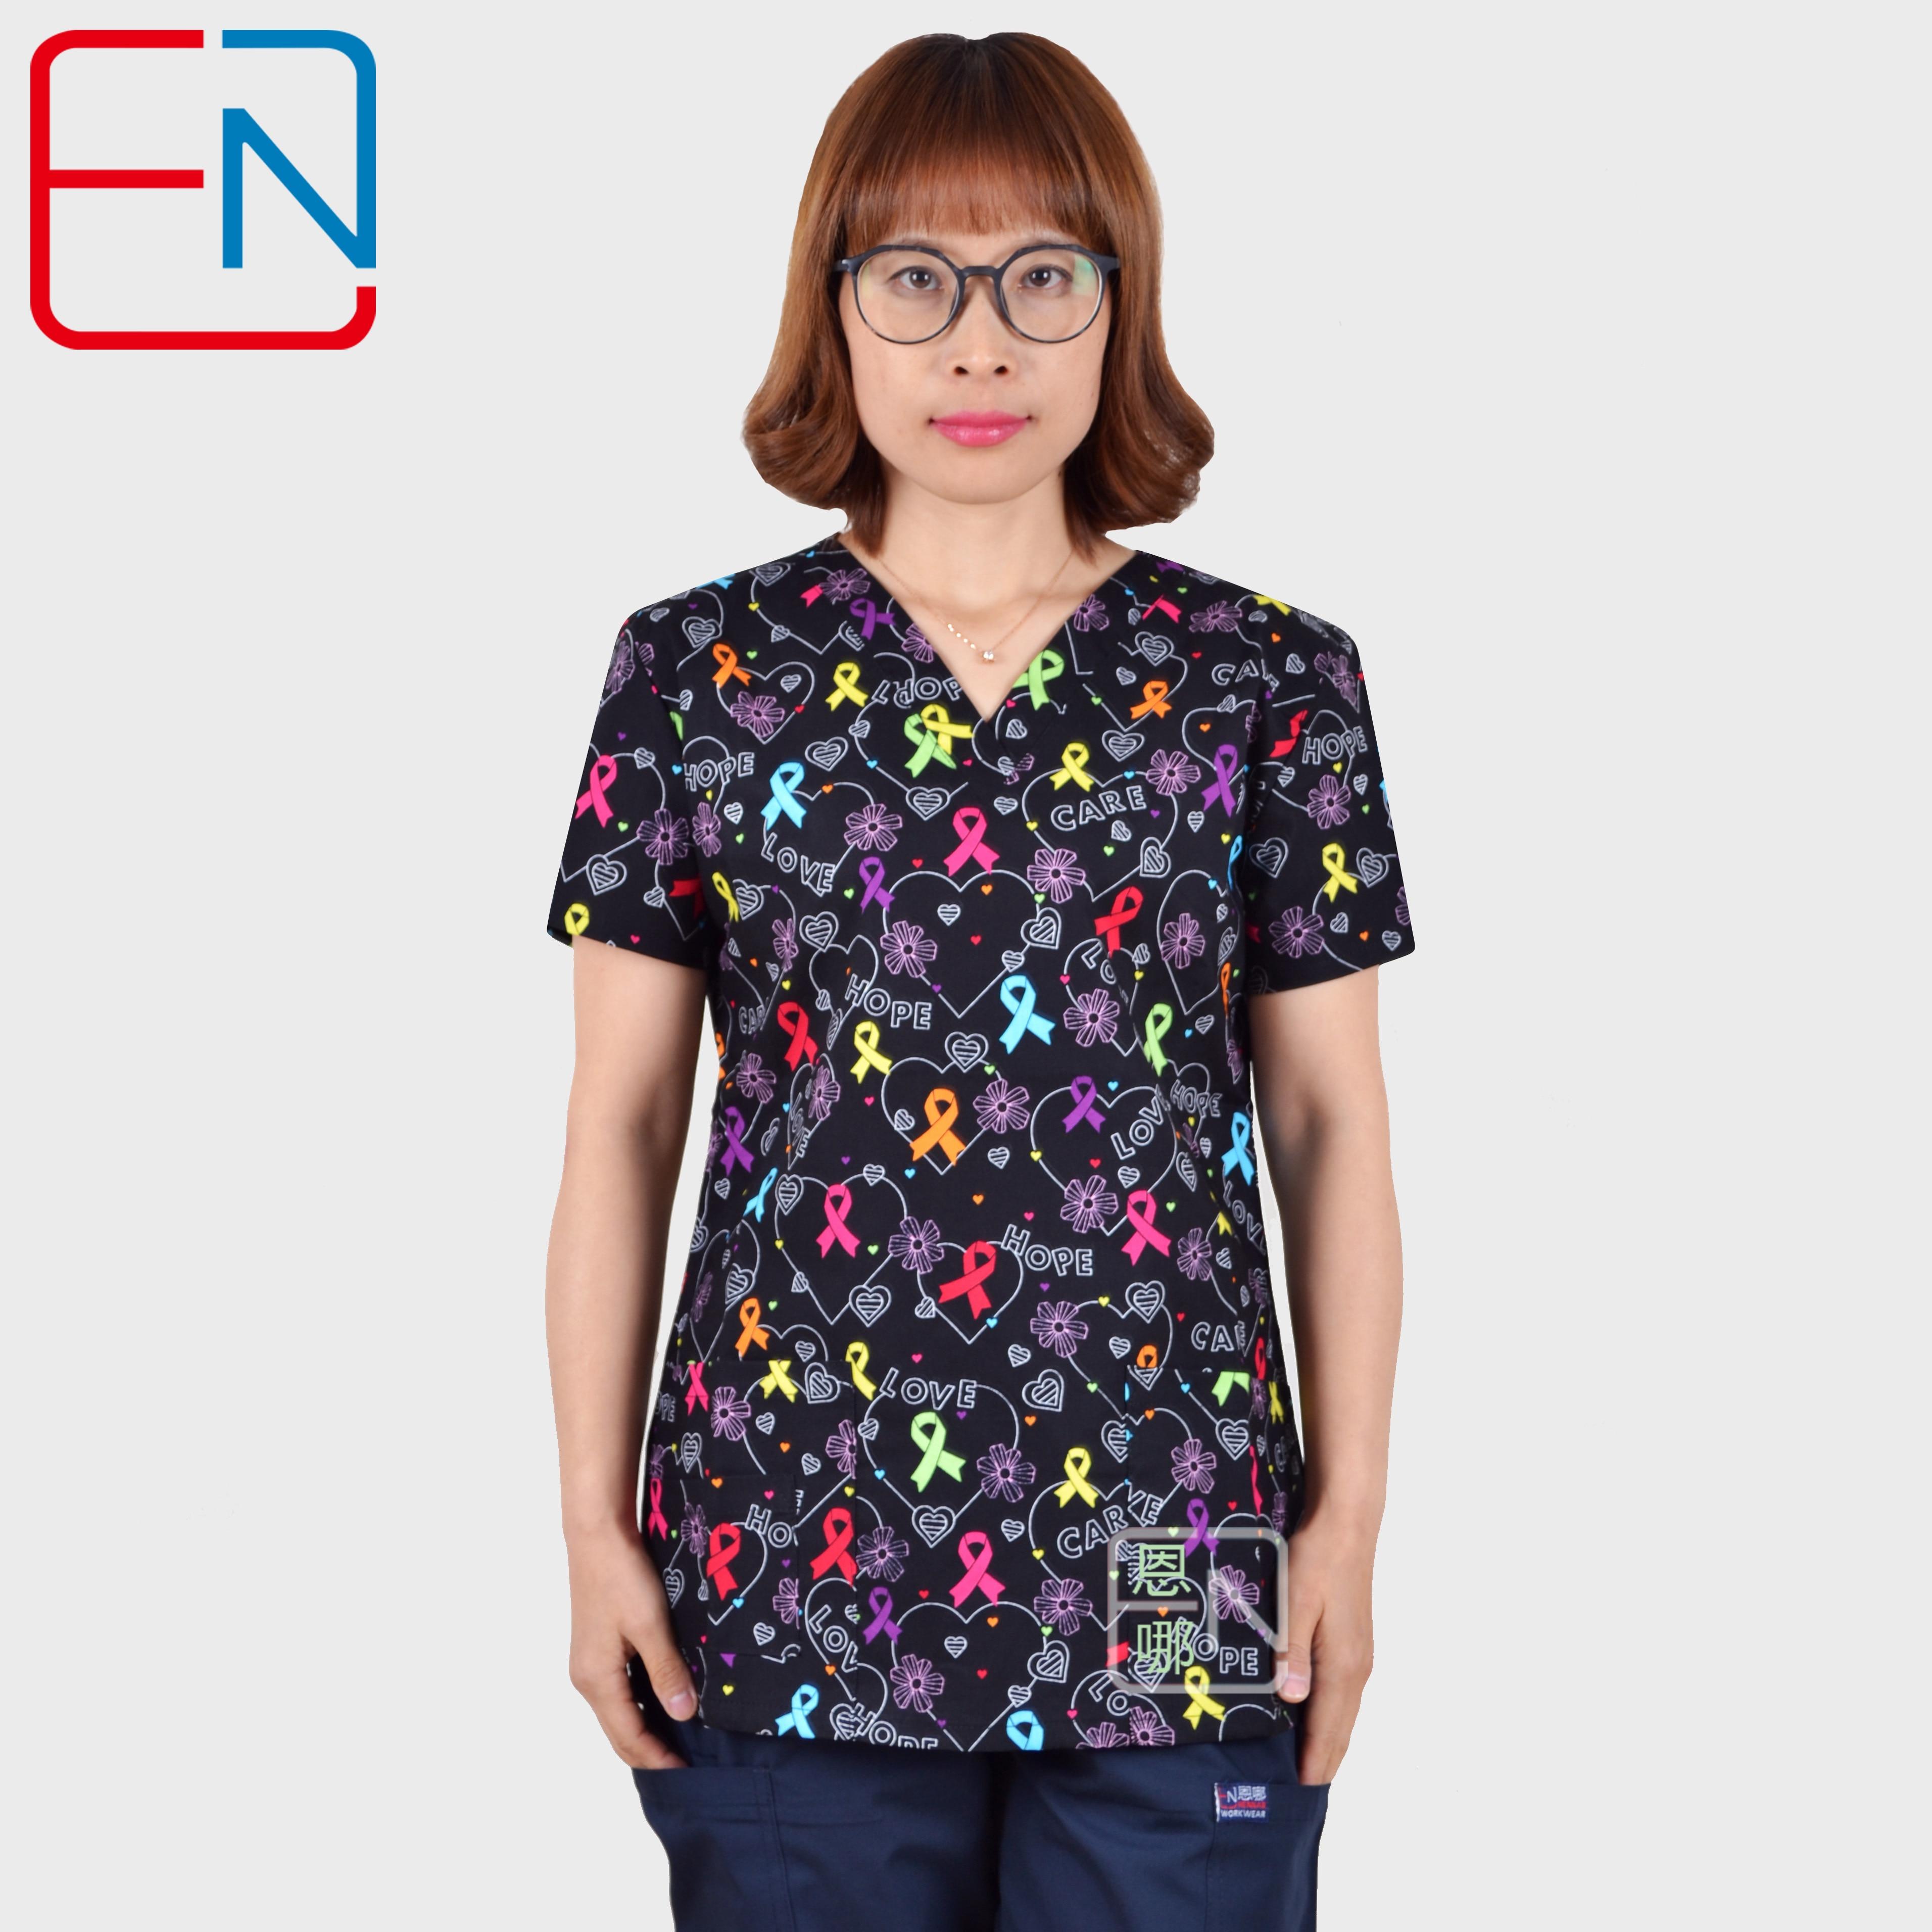 Hennar Women Medical Uniforms V-Neck Cartoon Print Clinical Scrub Top Short Sleeve 100% Cotton Hospital Surgical Scrubs Top